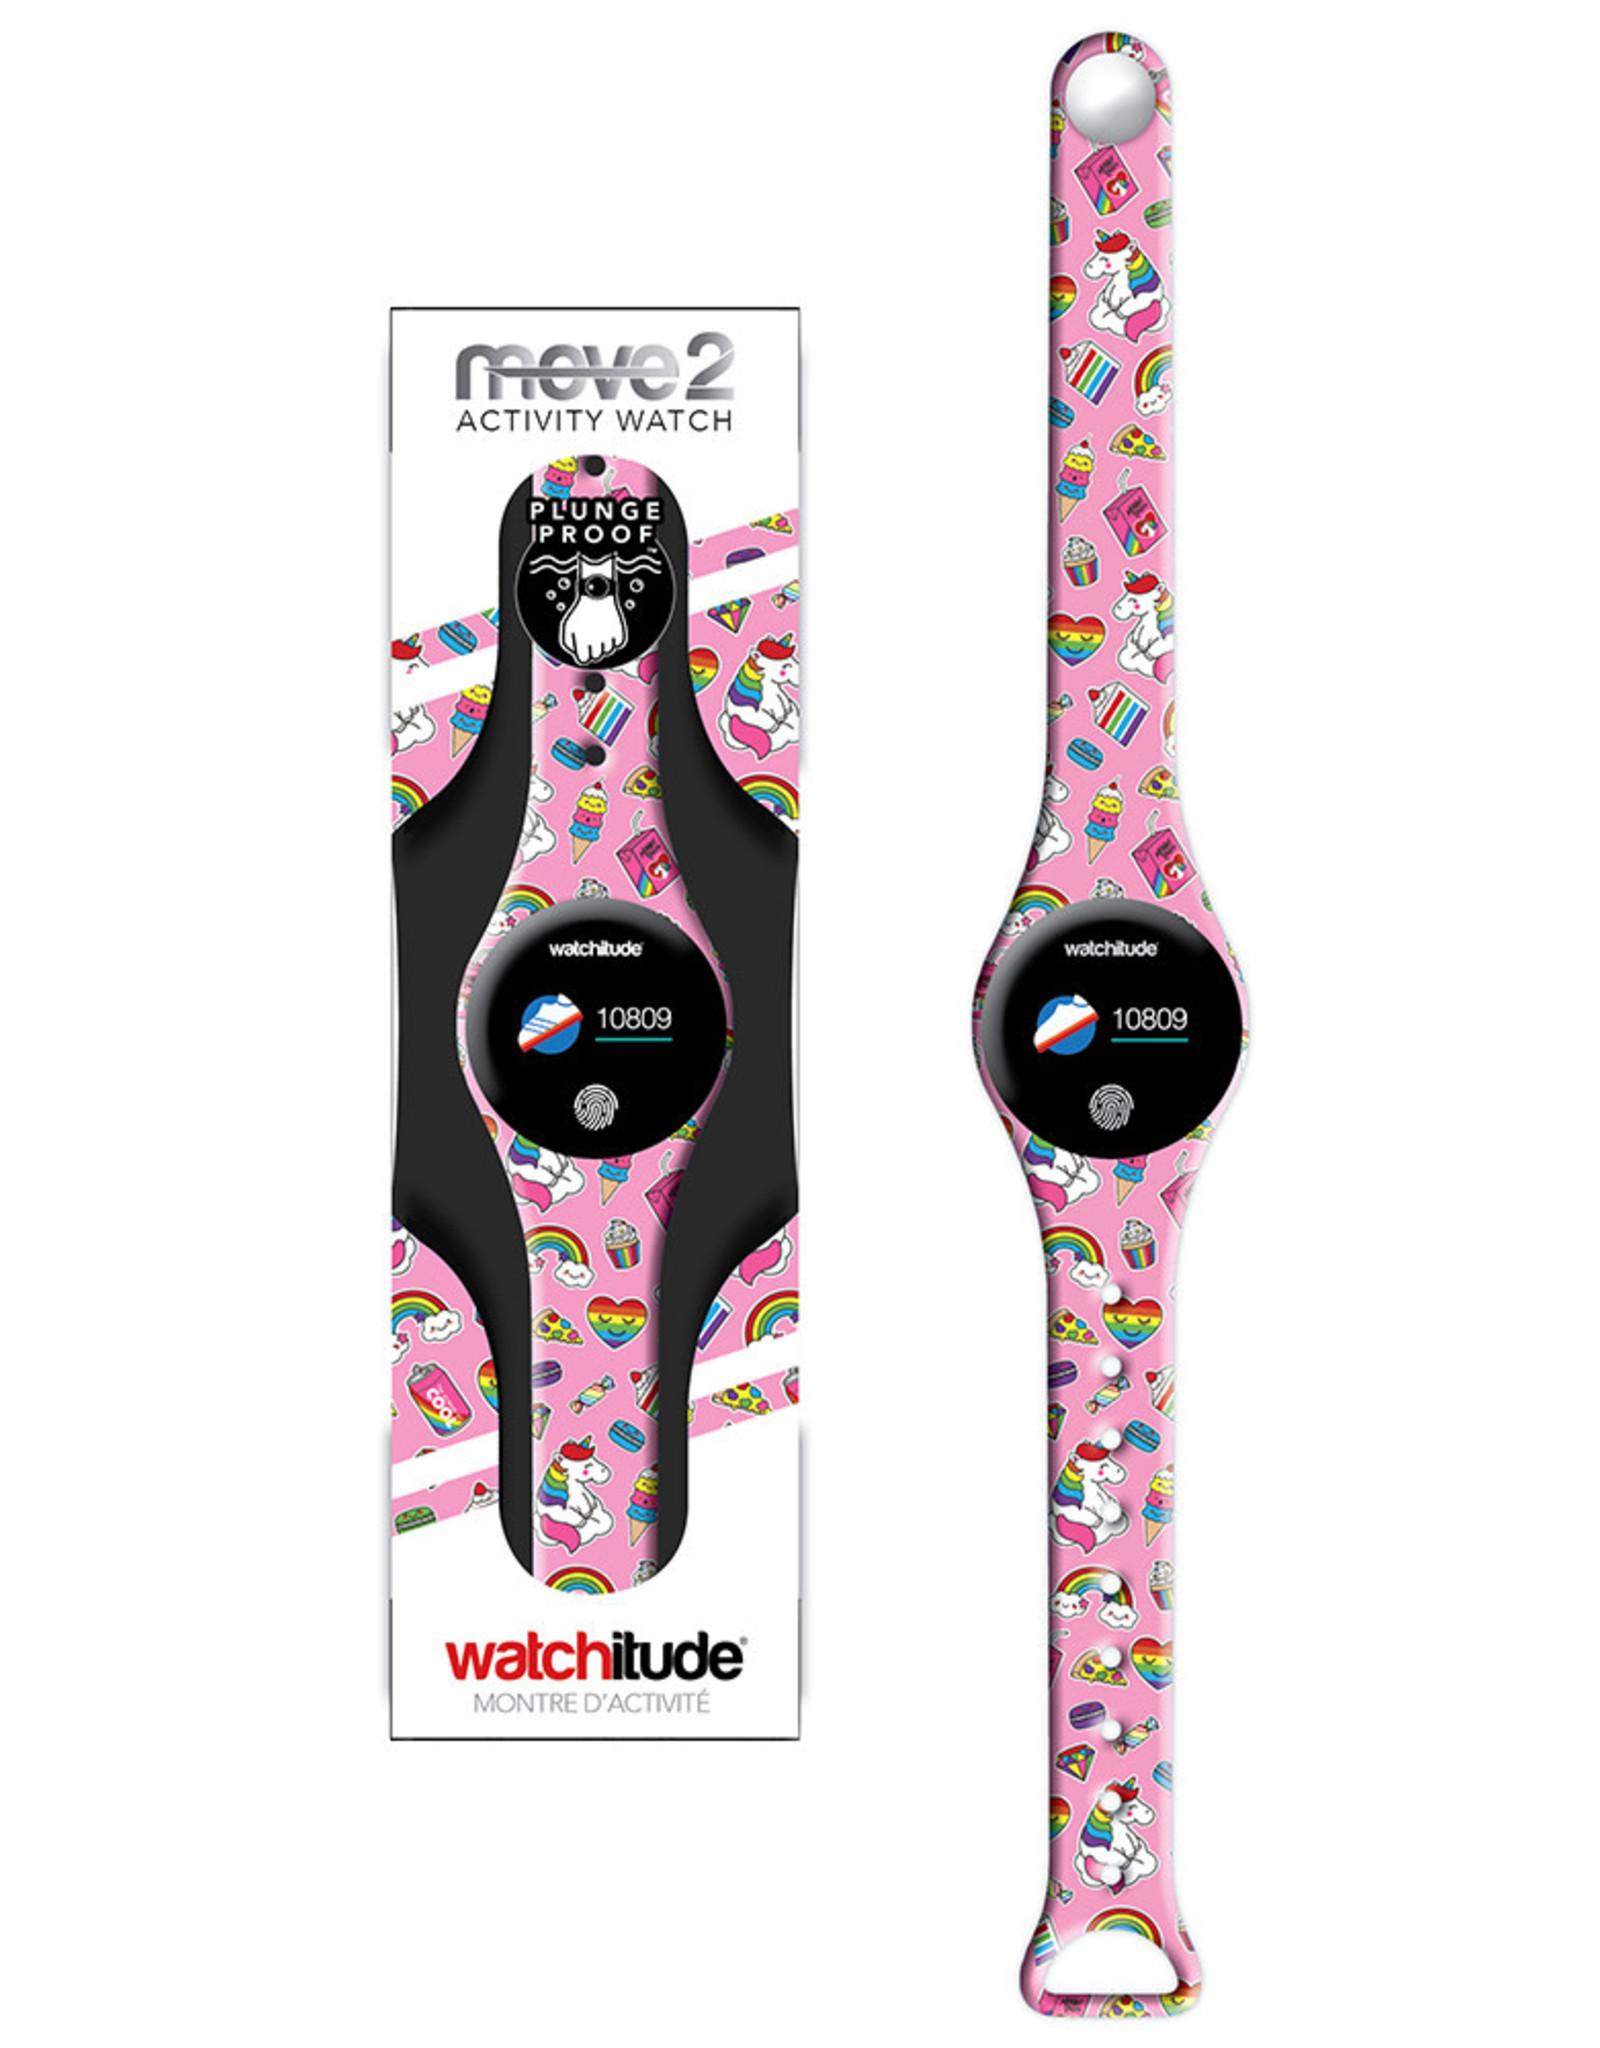 Watchitude Unicorn Treats - Move2 - Kids Activity Plunge Proof Watch